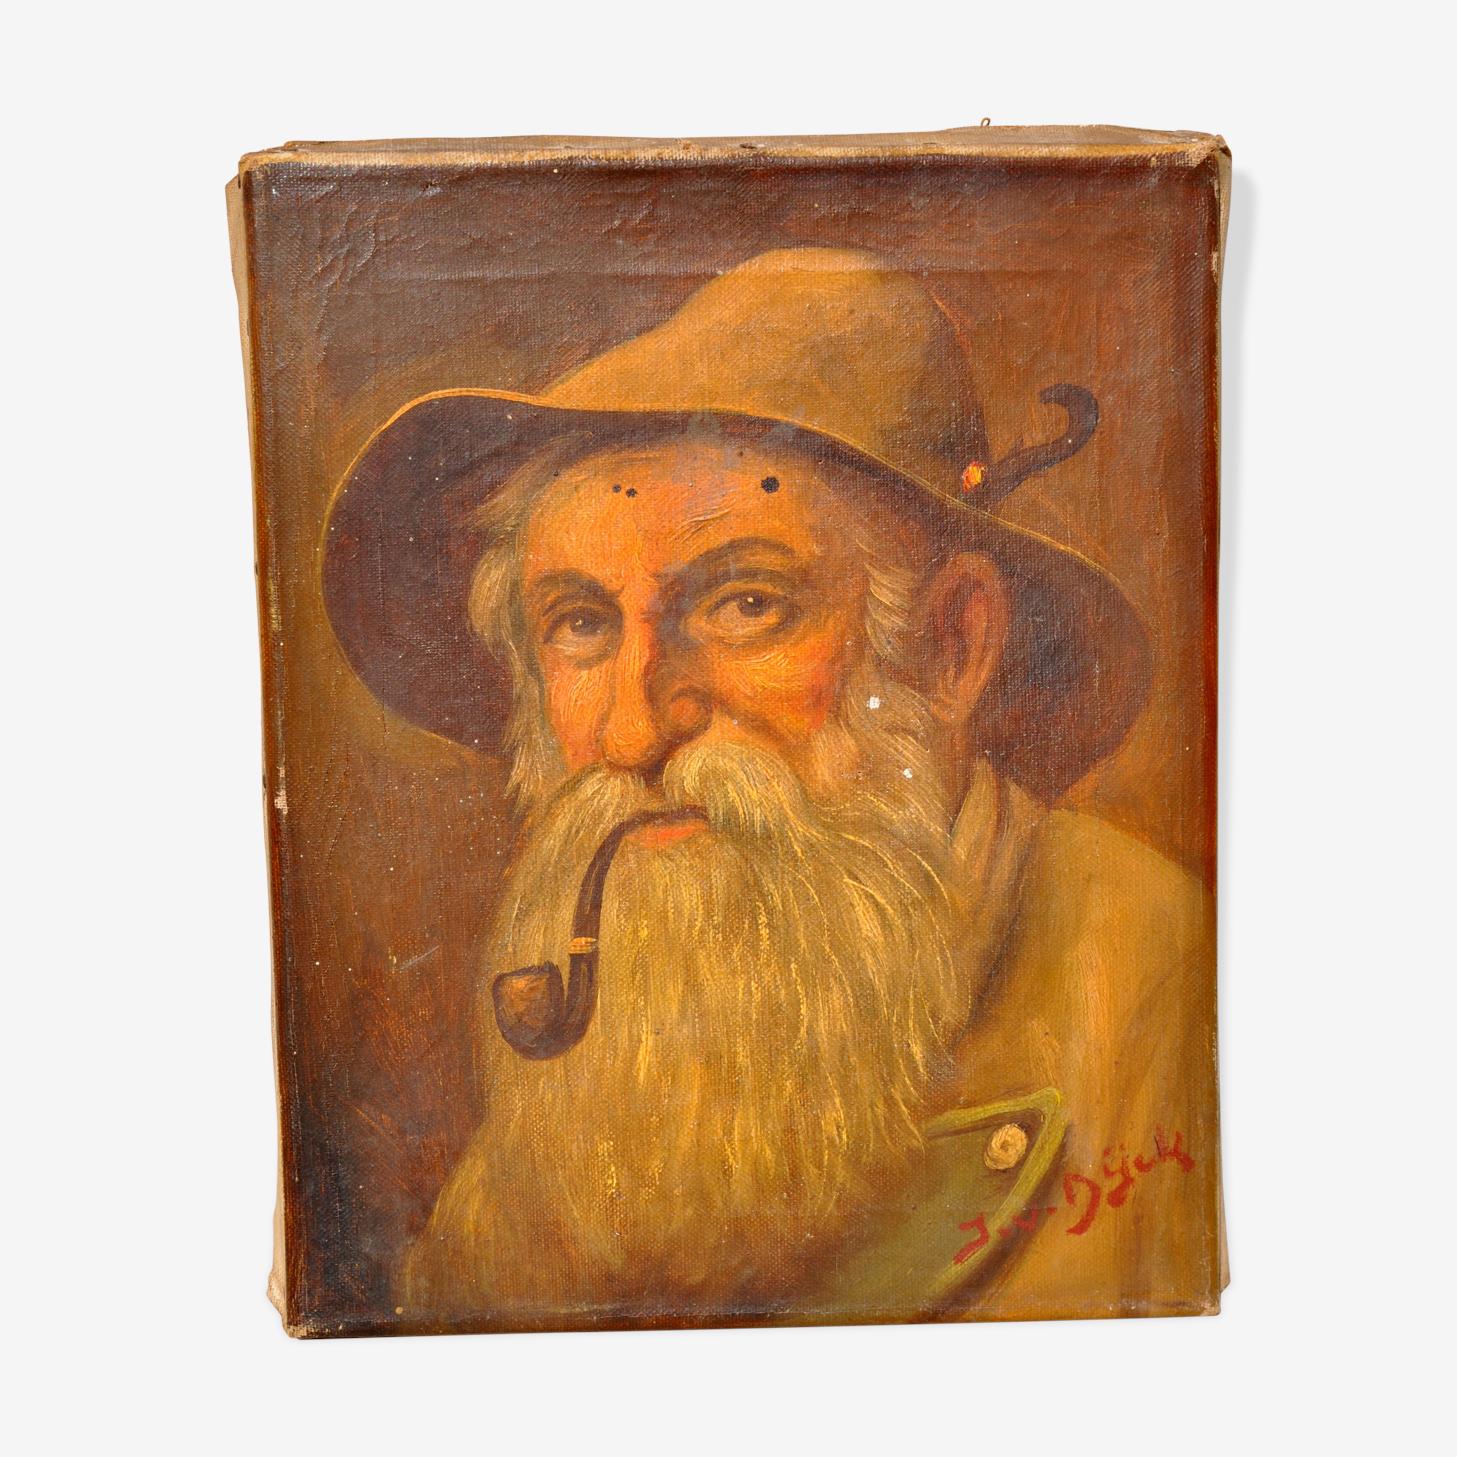 Portrait old old man smoking pipe